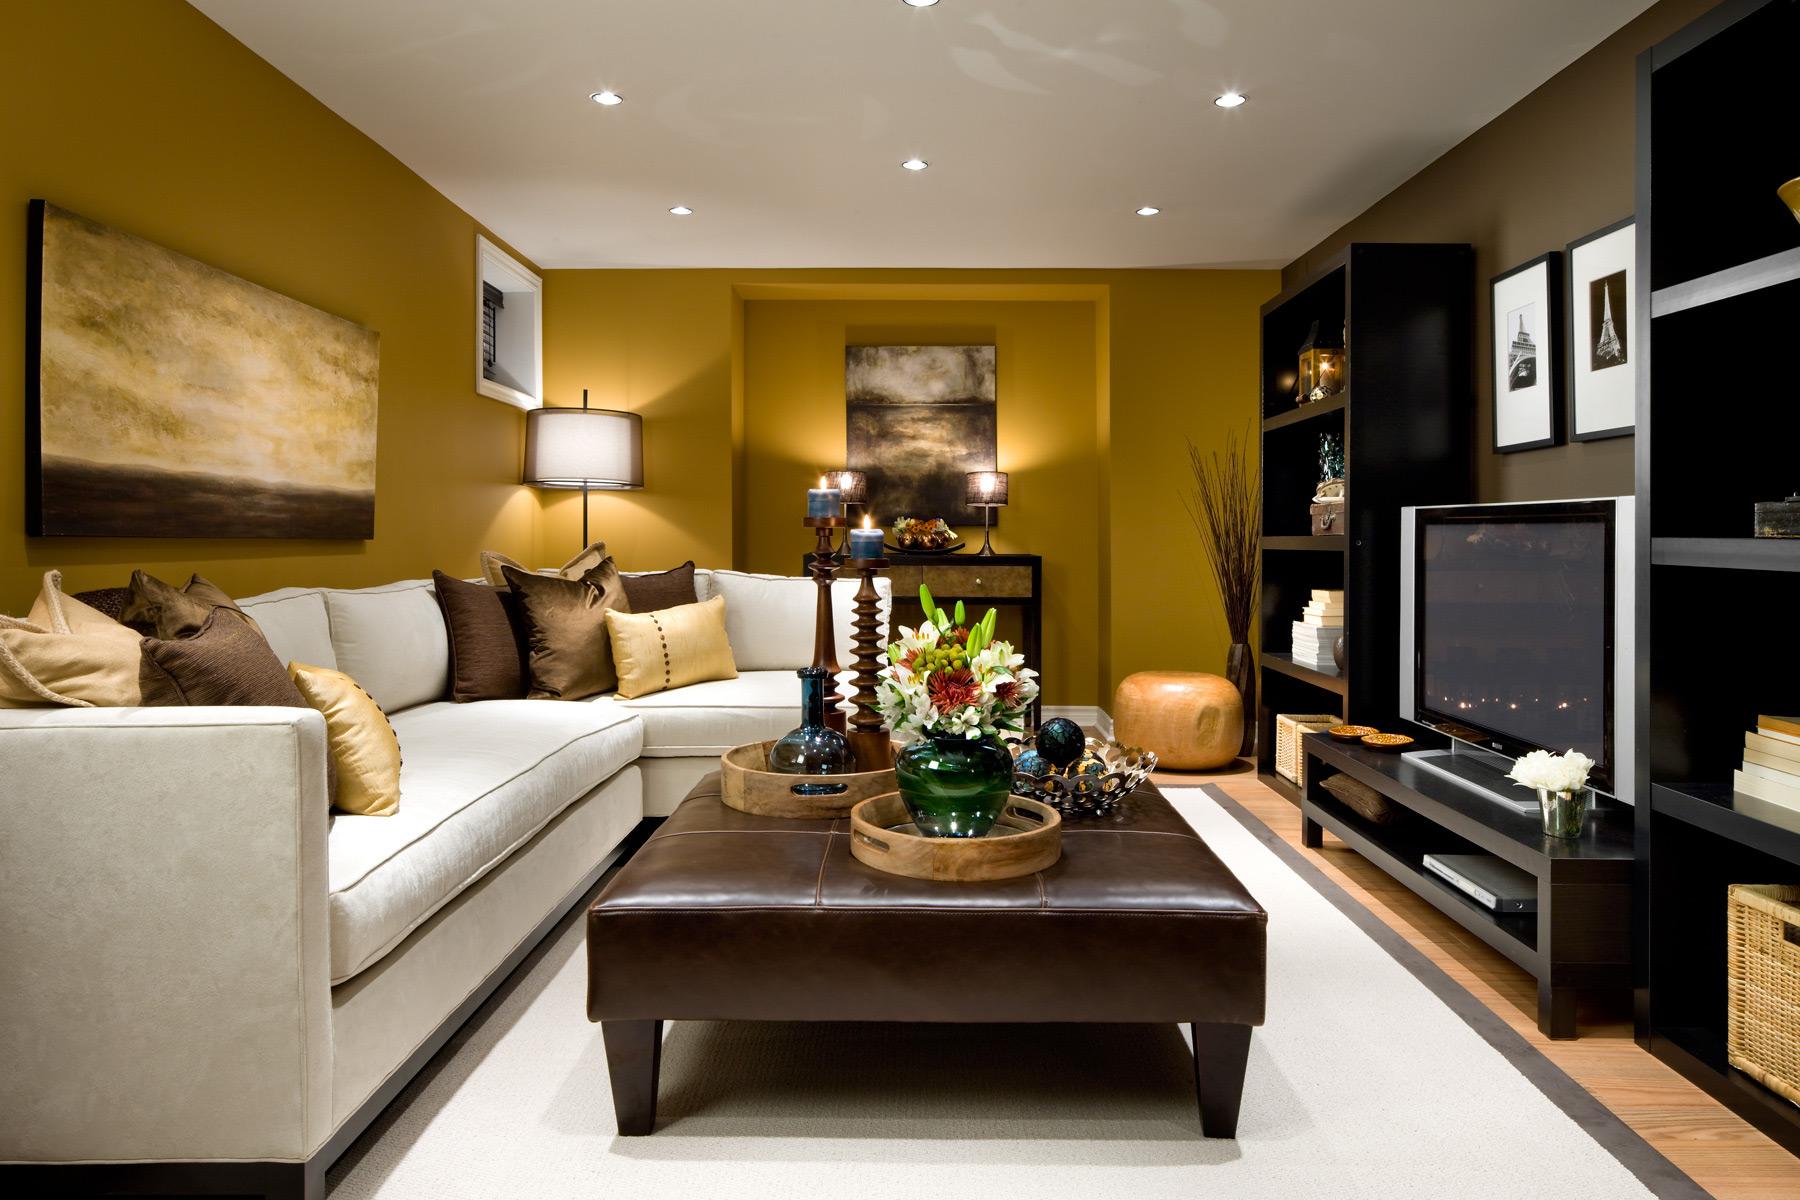 Fullsize Of Small Living Room Design Idea